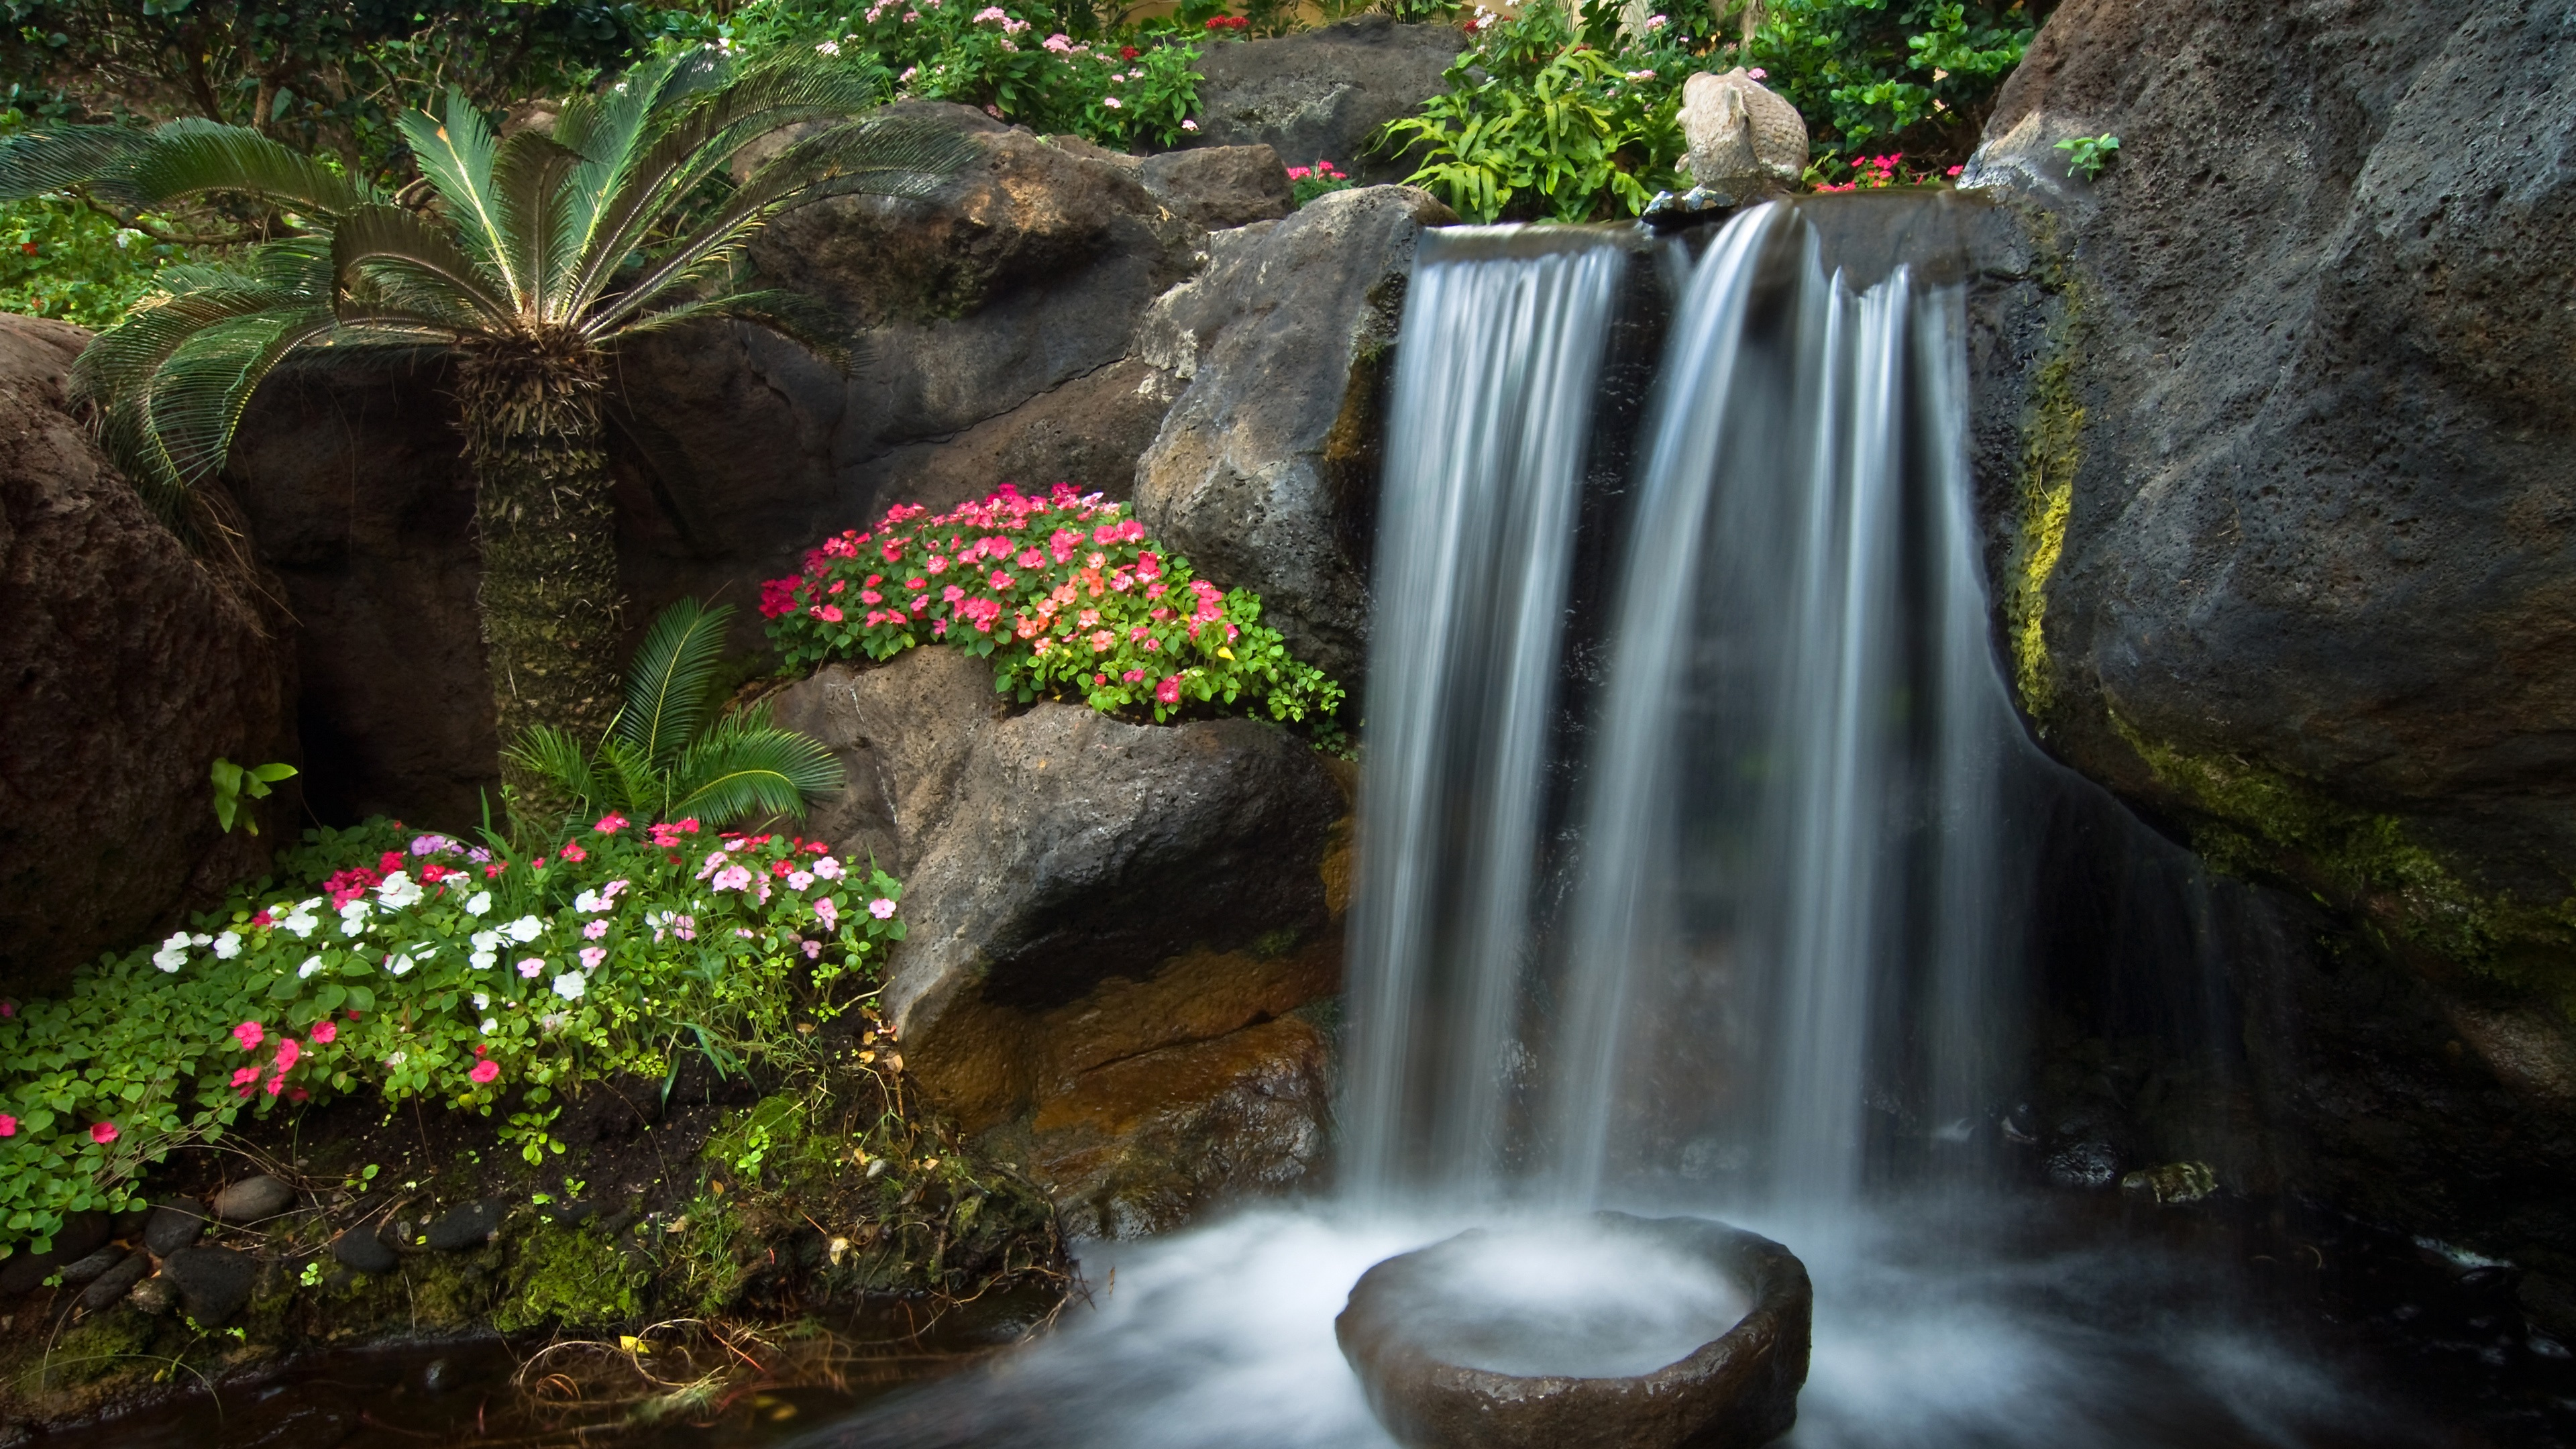 fonds d 39 cran t l charger 3840x2160 jardin petite cascade pierres fleurs de p tunia palma. Black Bedroom Furniture Sets. Home Design Ideas